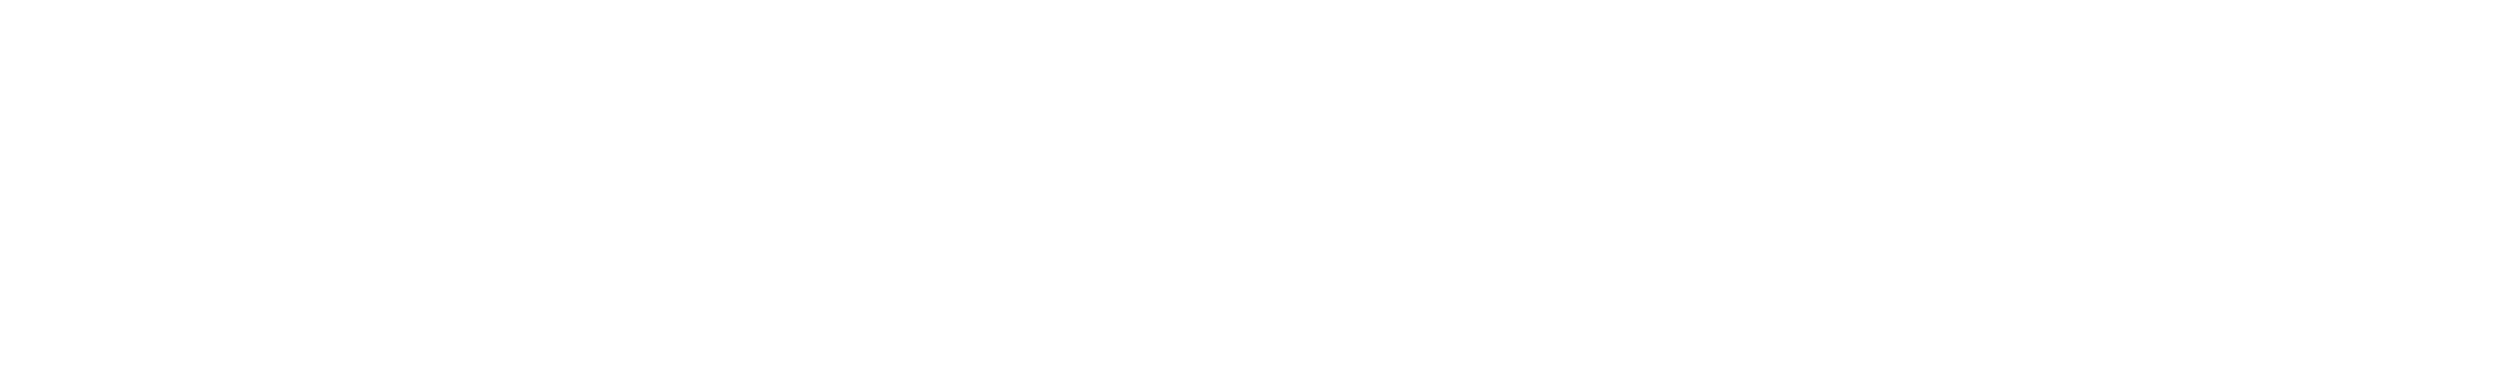 LivingWaterLogo.png